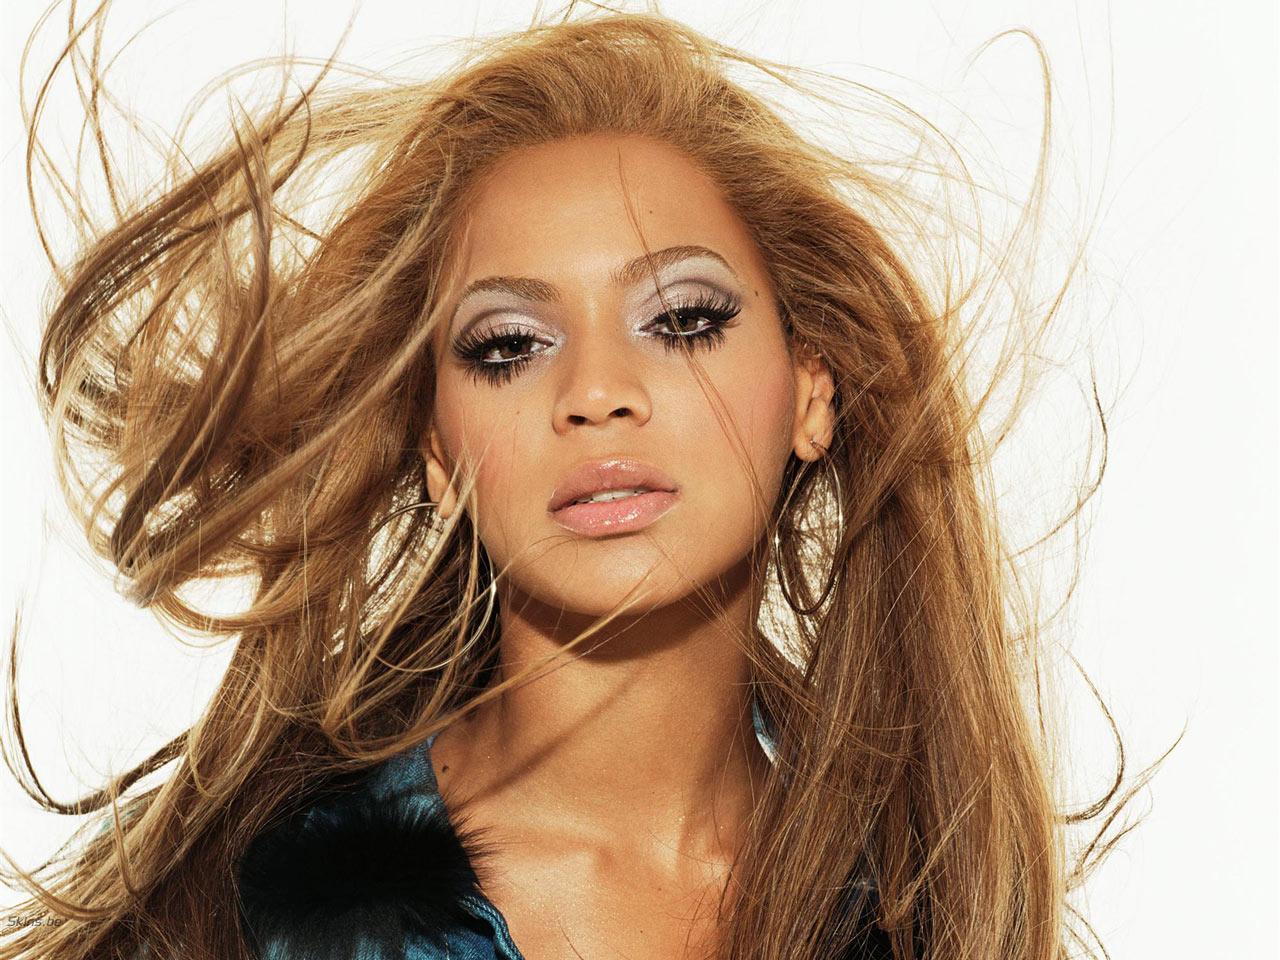 http://2.bp.blogspot.com/-y9s_Ib6mgo8/UH3cTBA1tOI/AAAAAAAAGCo/obXdpulEolQ/s1600/Beyonce+Knowles+pic.jpg